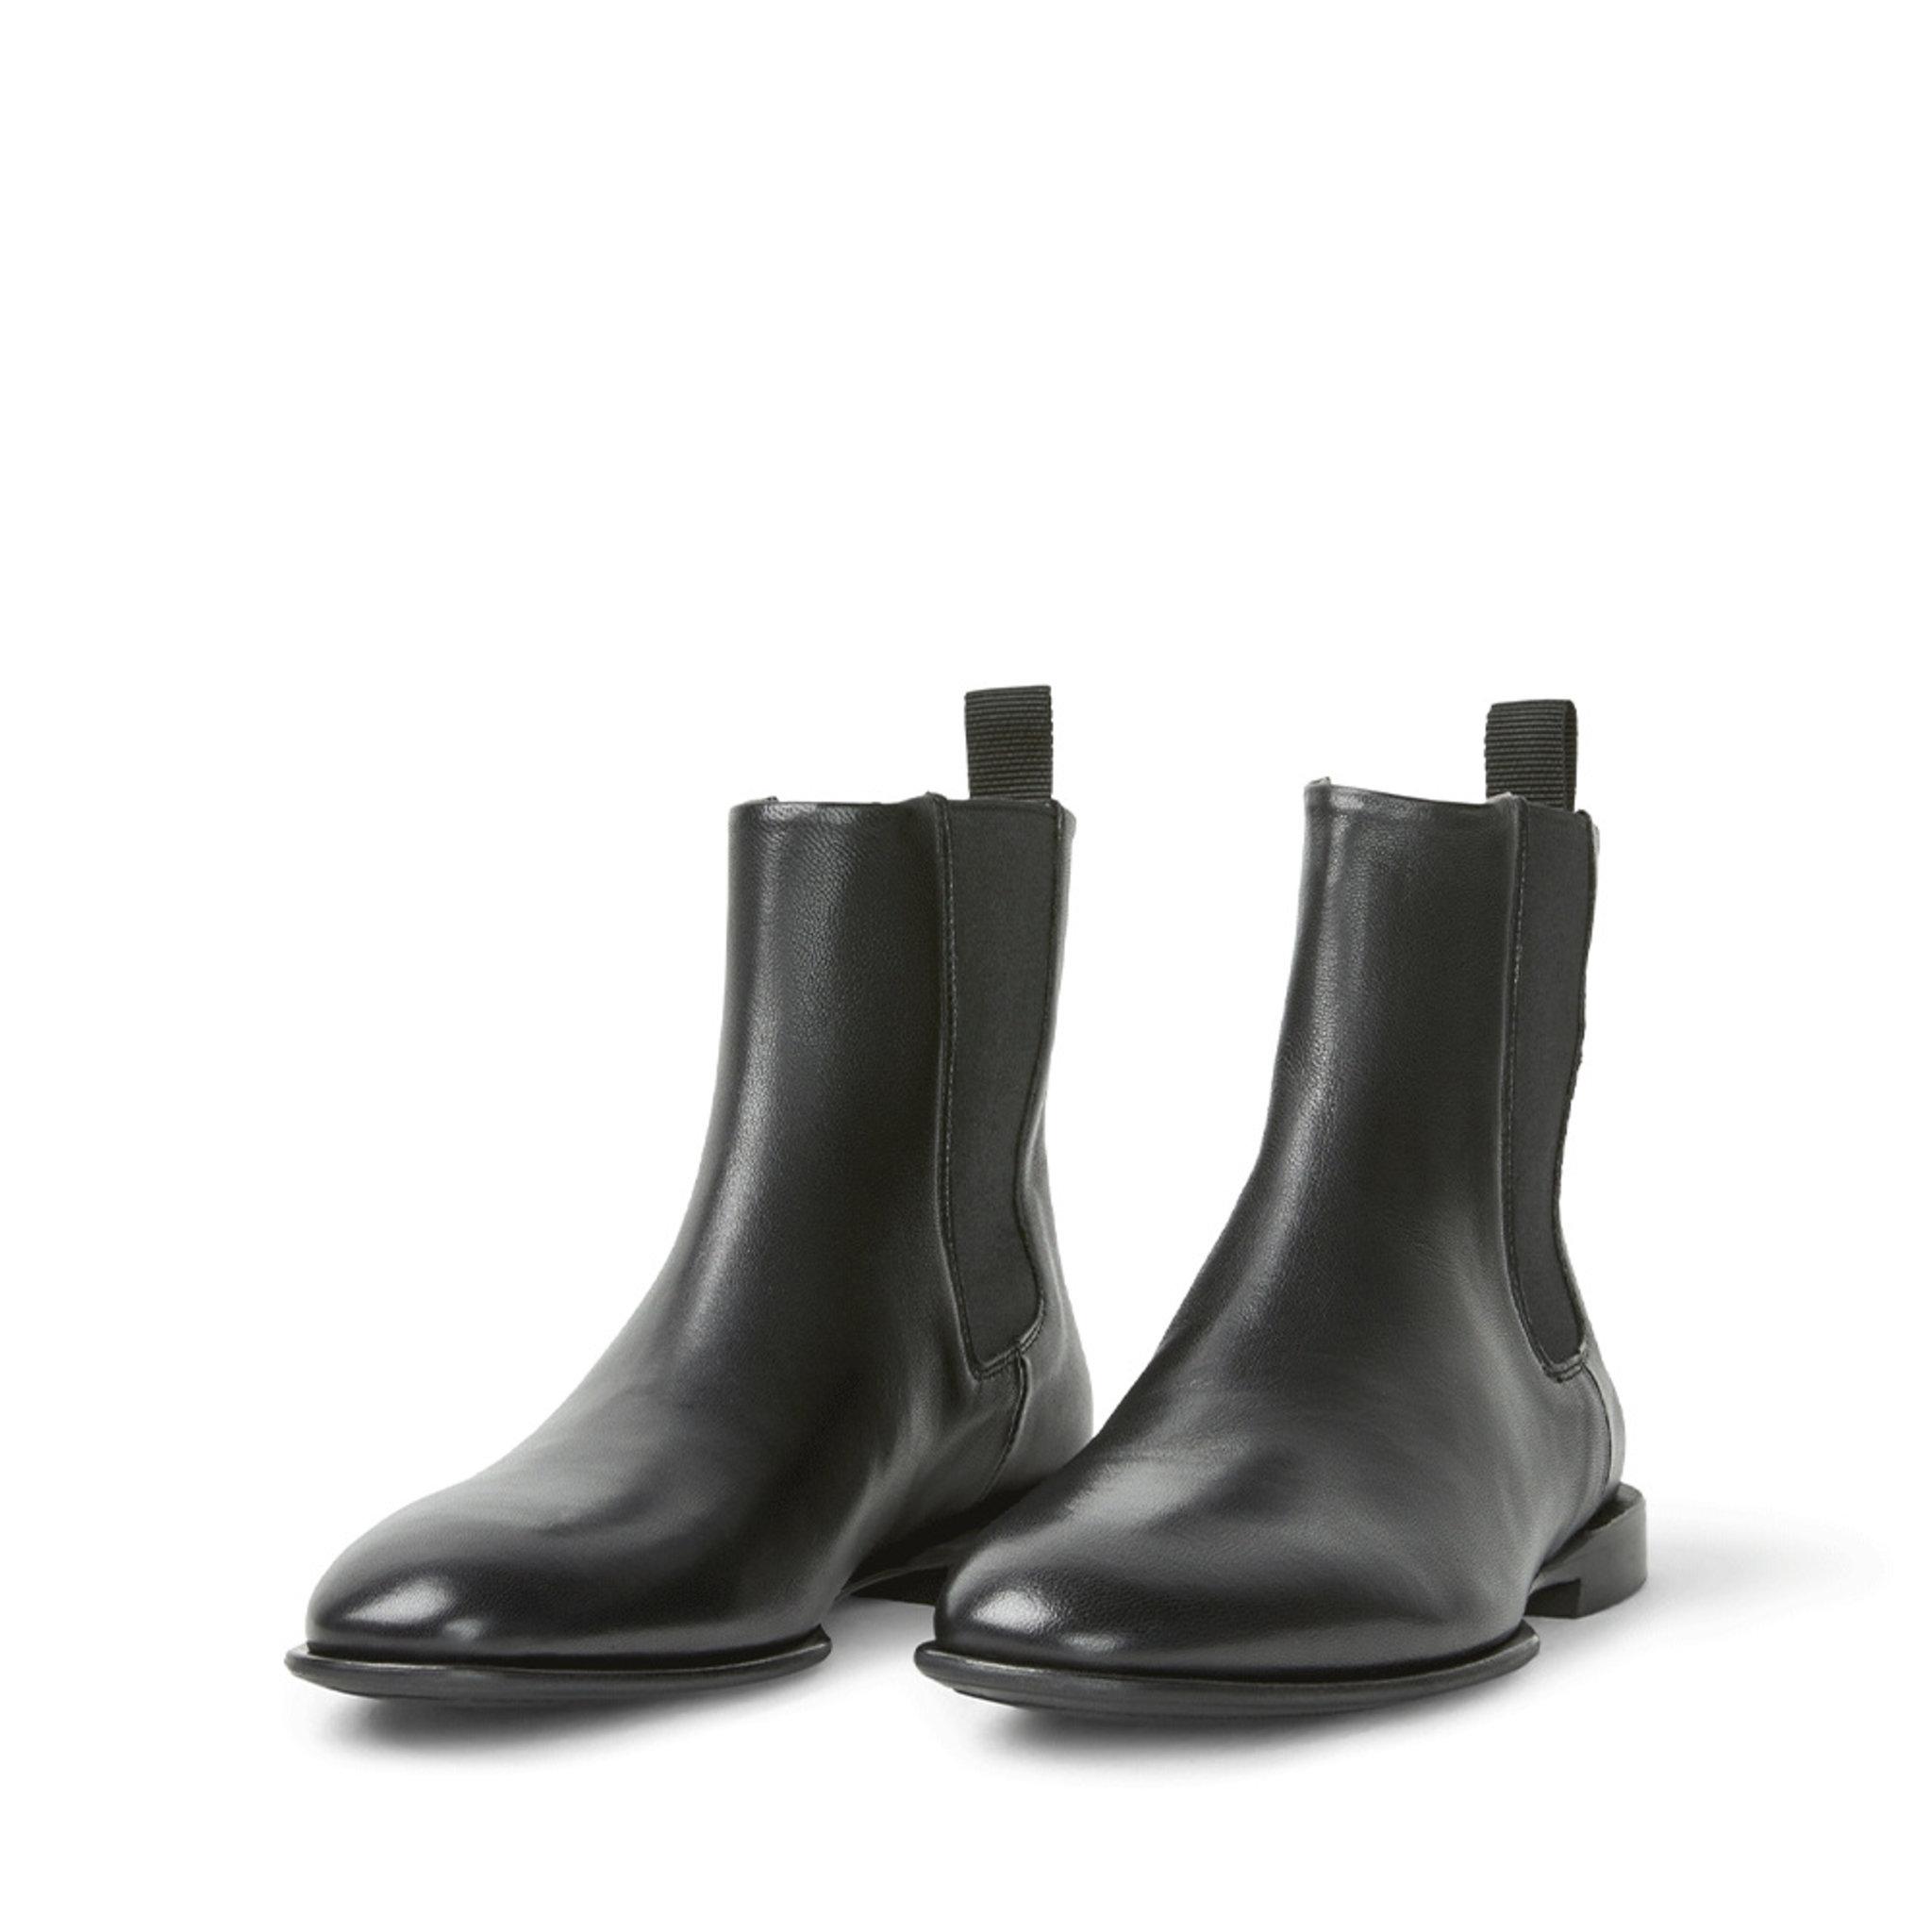 Fallon Low Chelsea Boot, svart